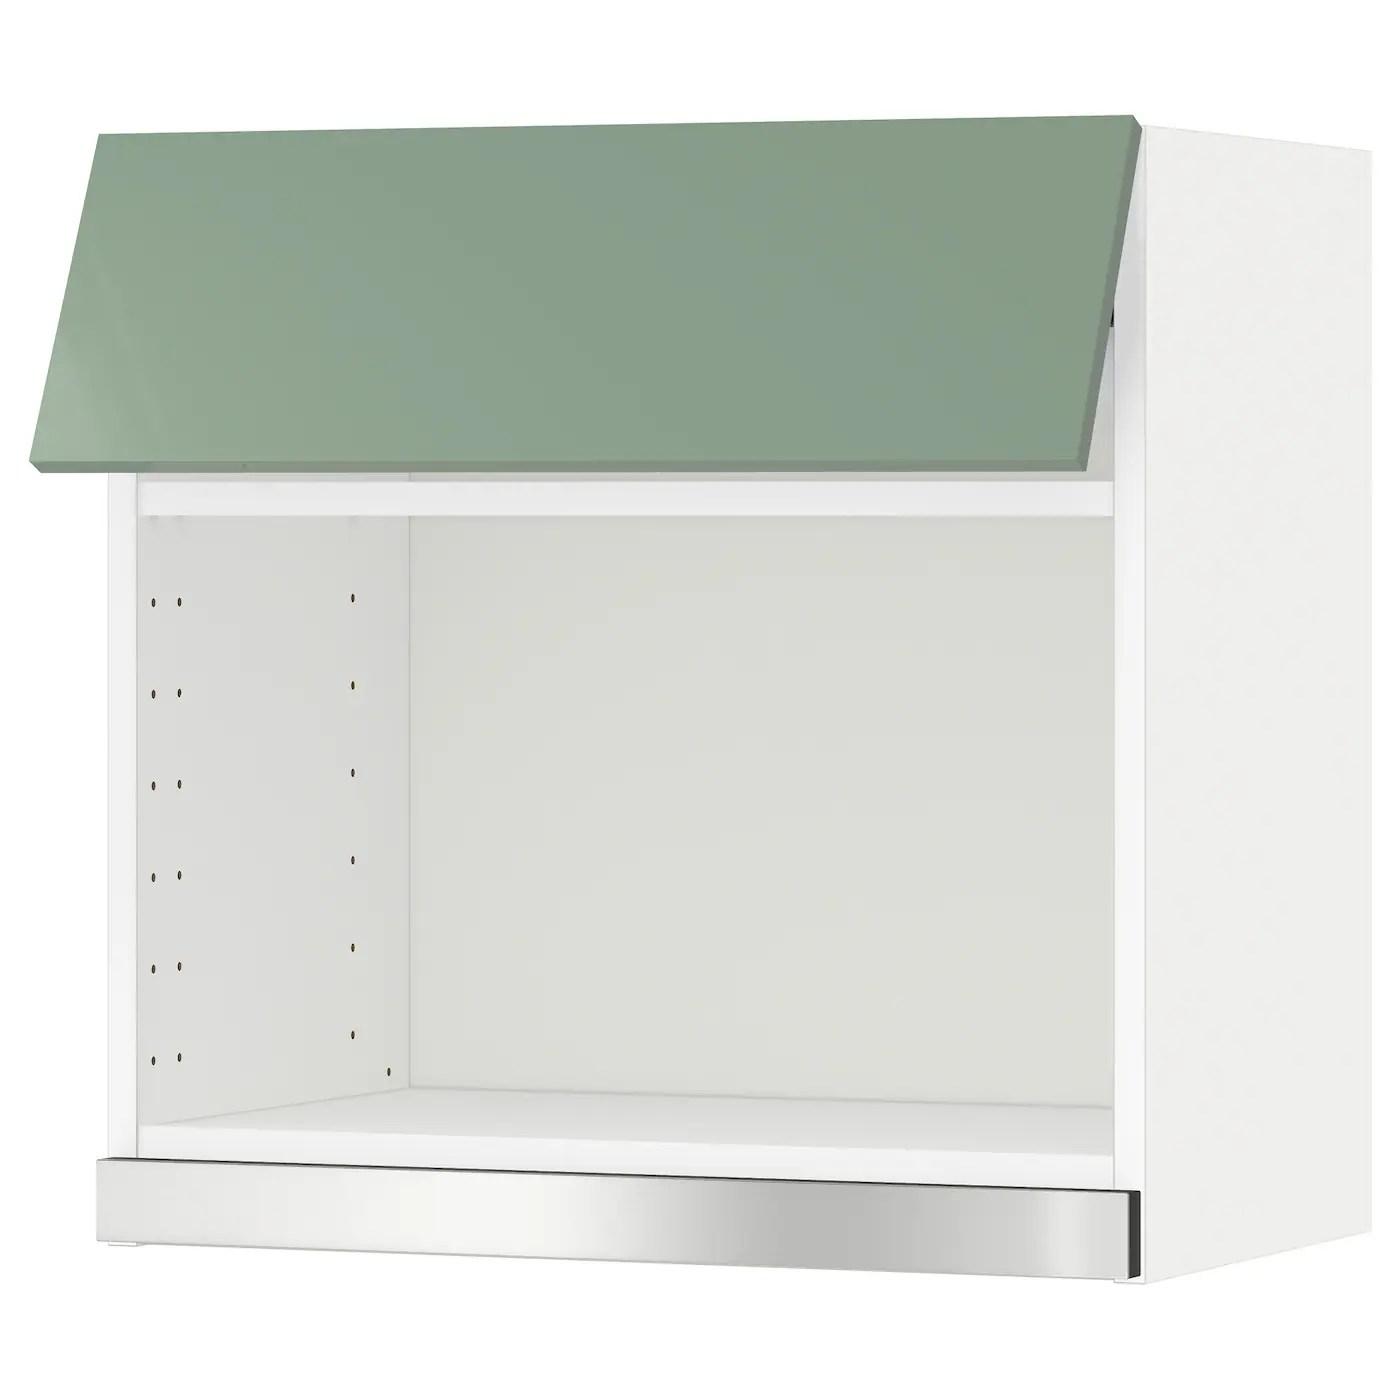 Mueble Auxiliar Microondas Ikea | Mueble Horno Y Microondas Ikea ...